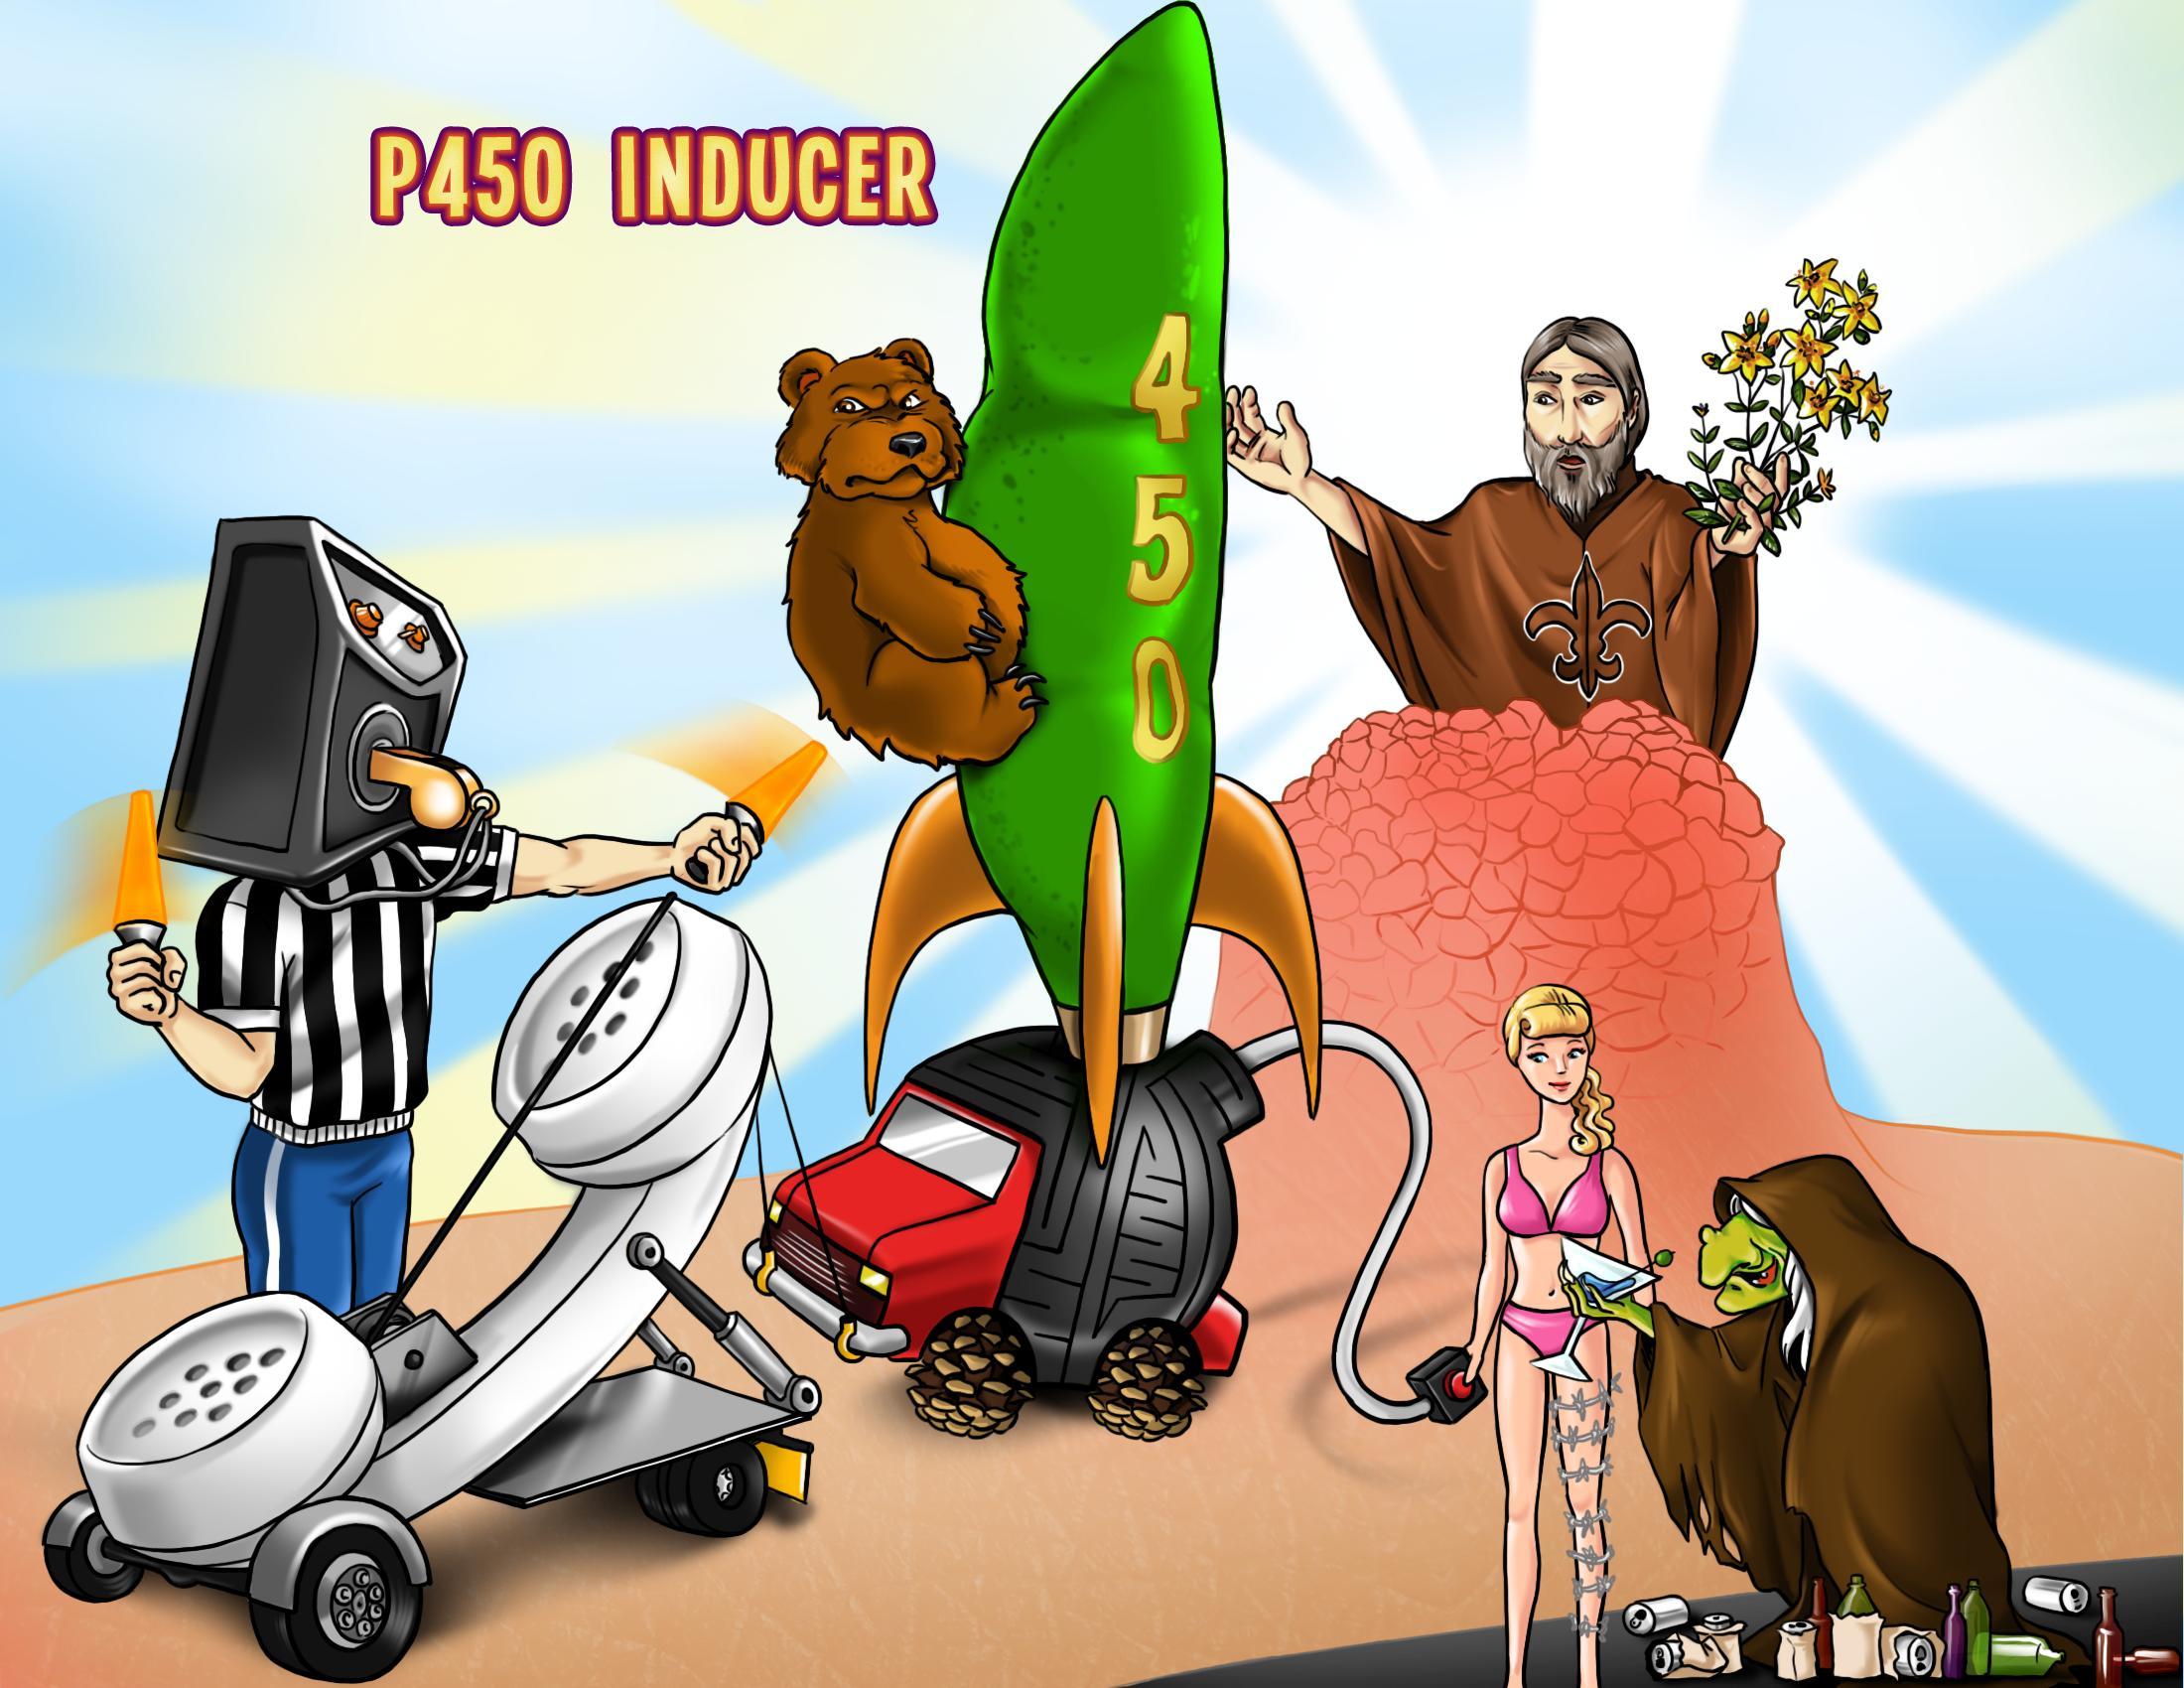 P450 Inducer